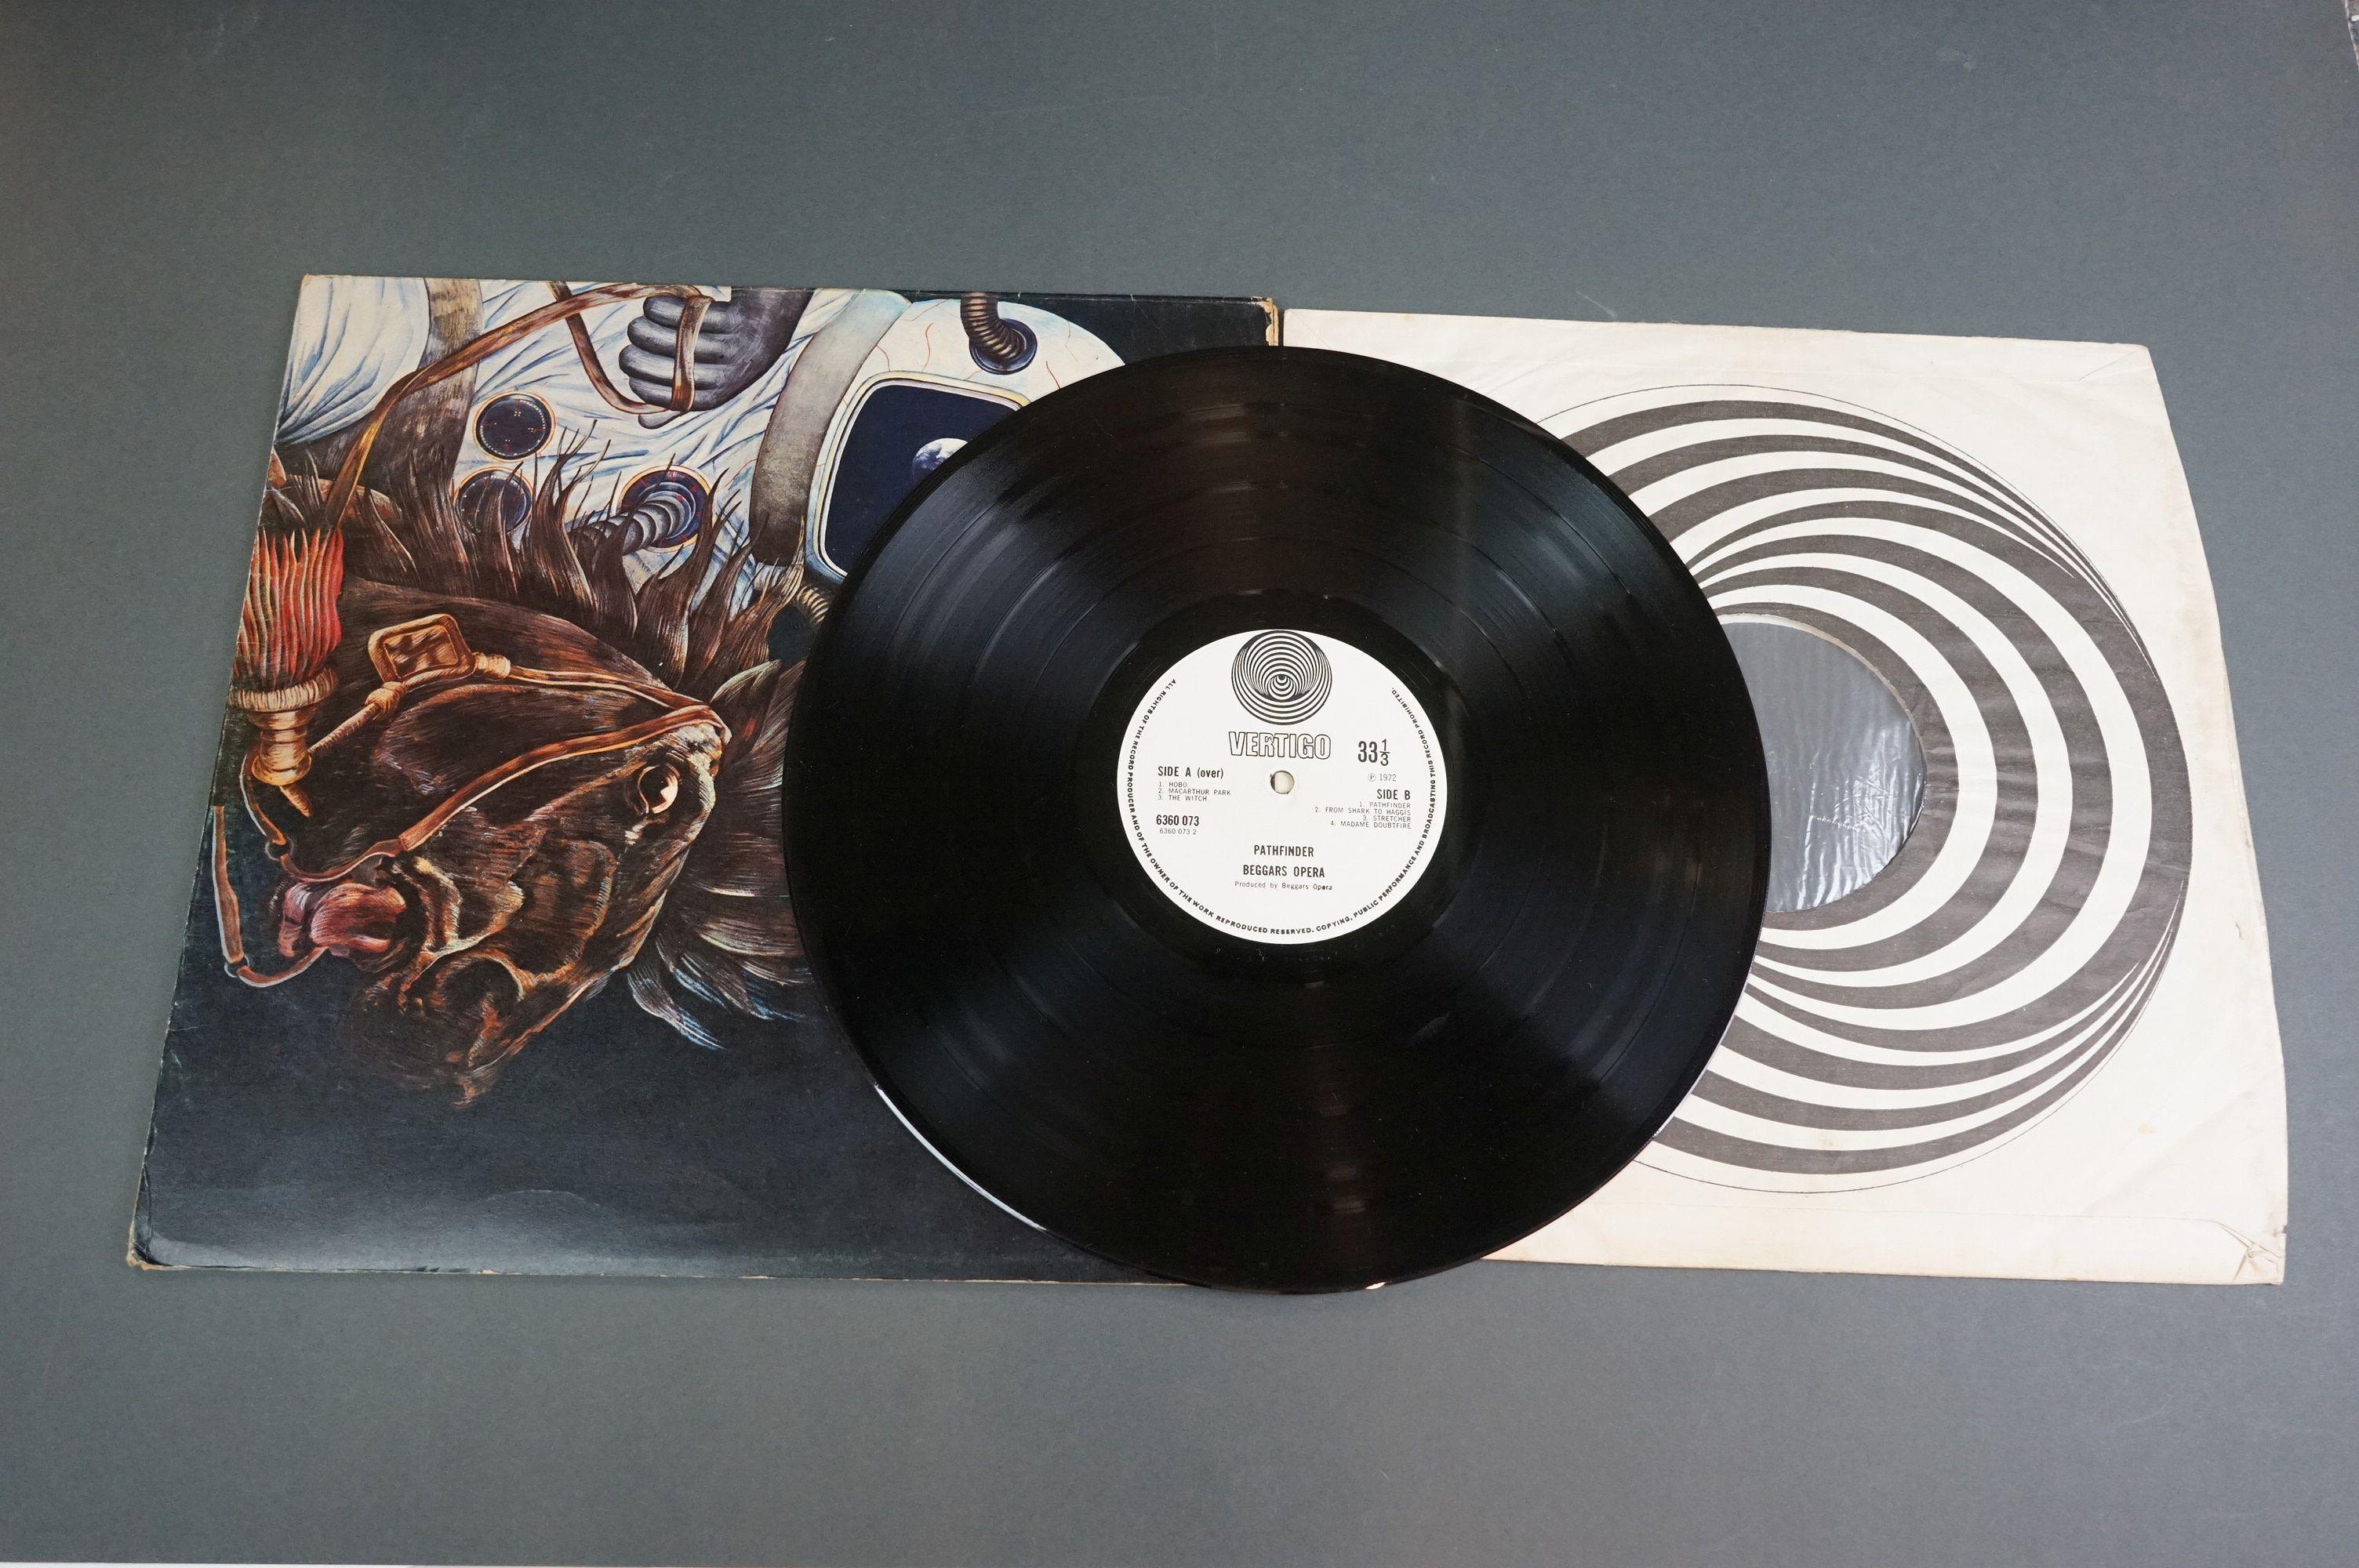 Vinyl - Two Beggars Opera LPs to include Pathfinder on Vertigo 6360073 small swirl label, foldout - Image 3 of 5